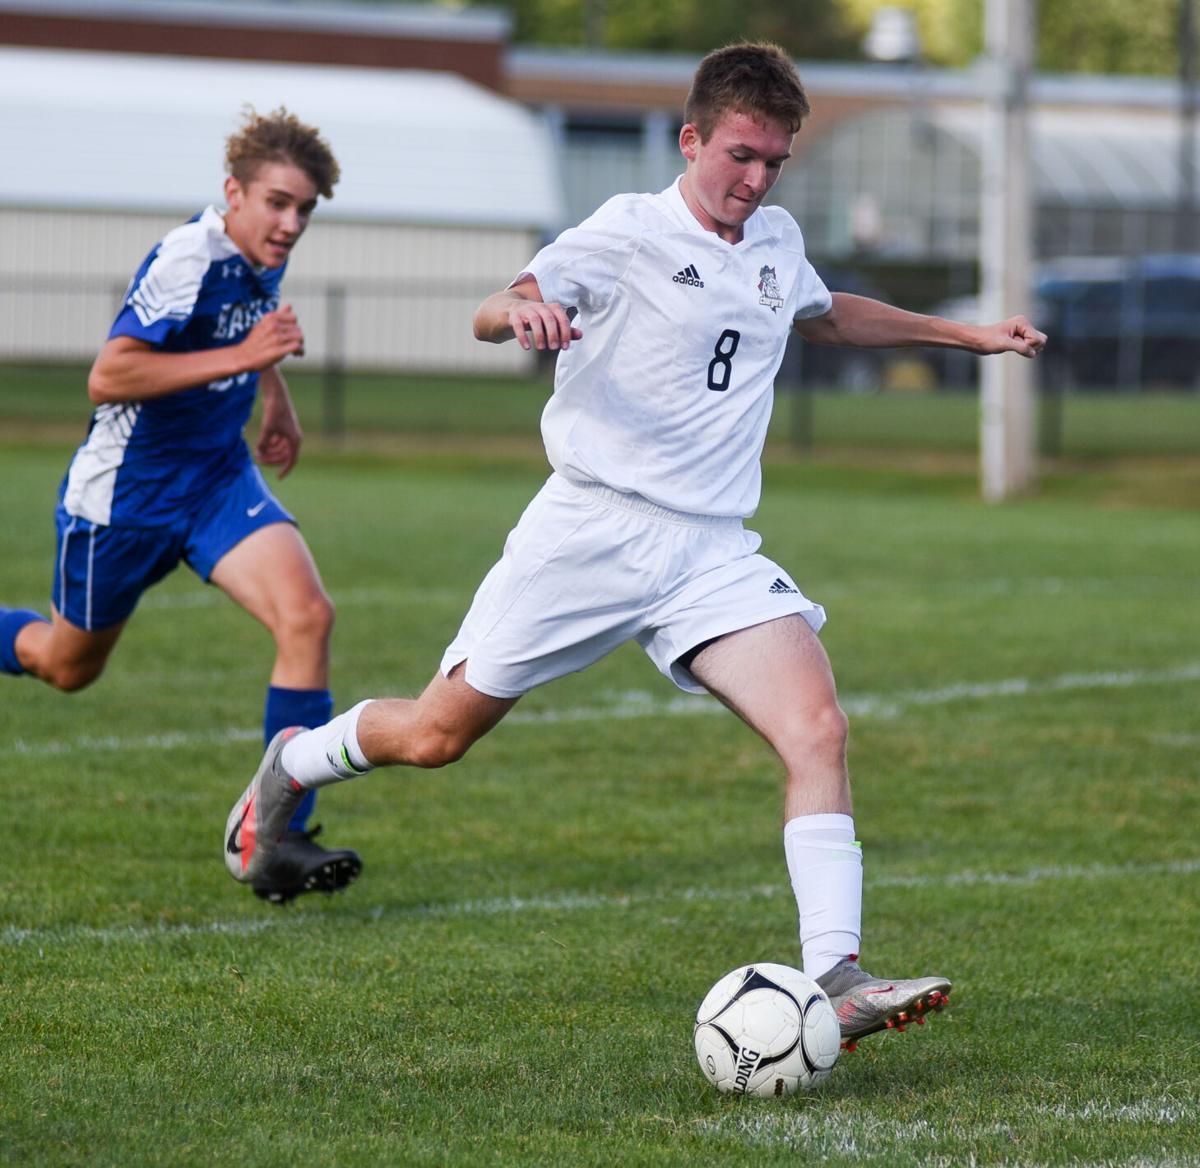 Soccer - Crawford Christian Academy vs. CASH